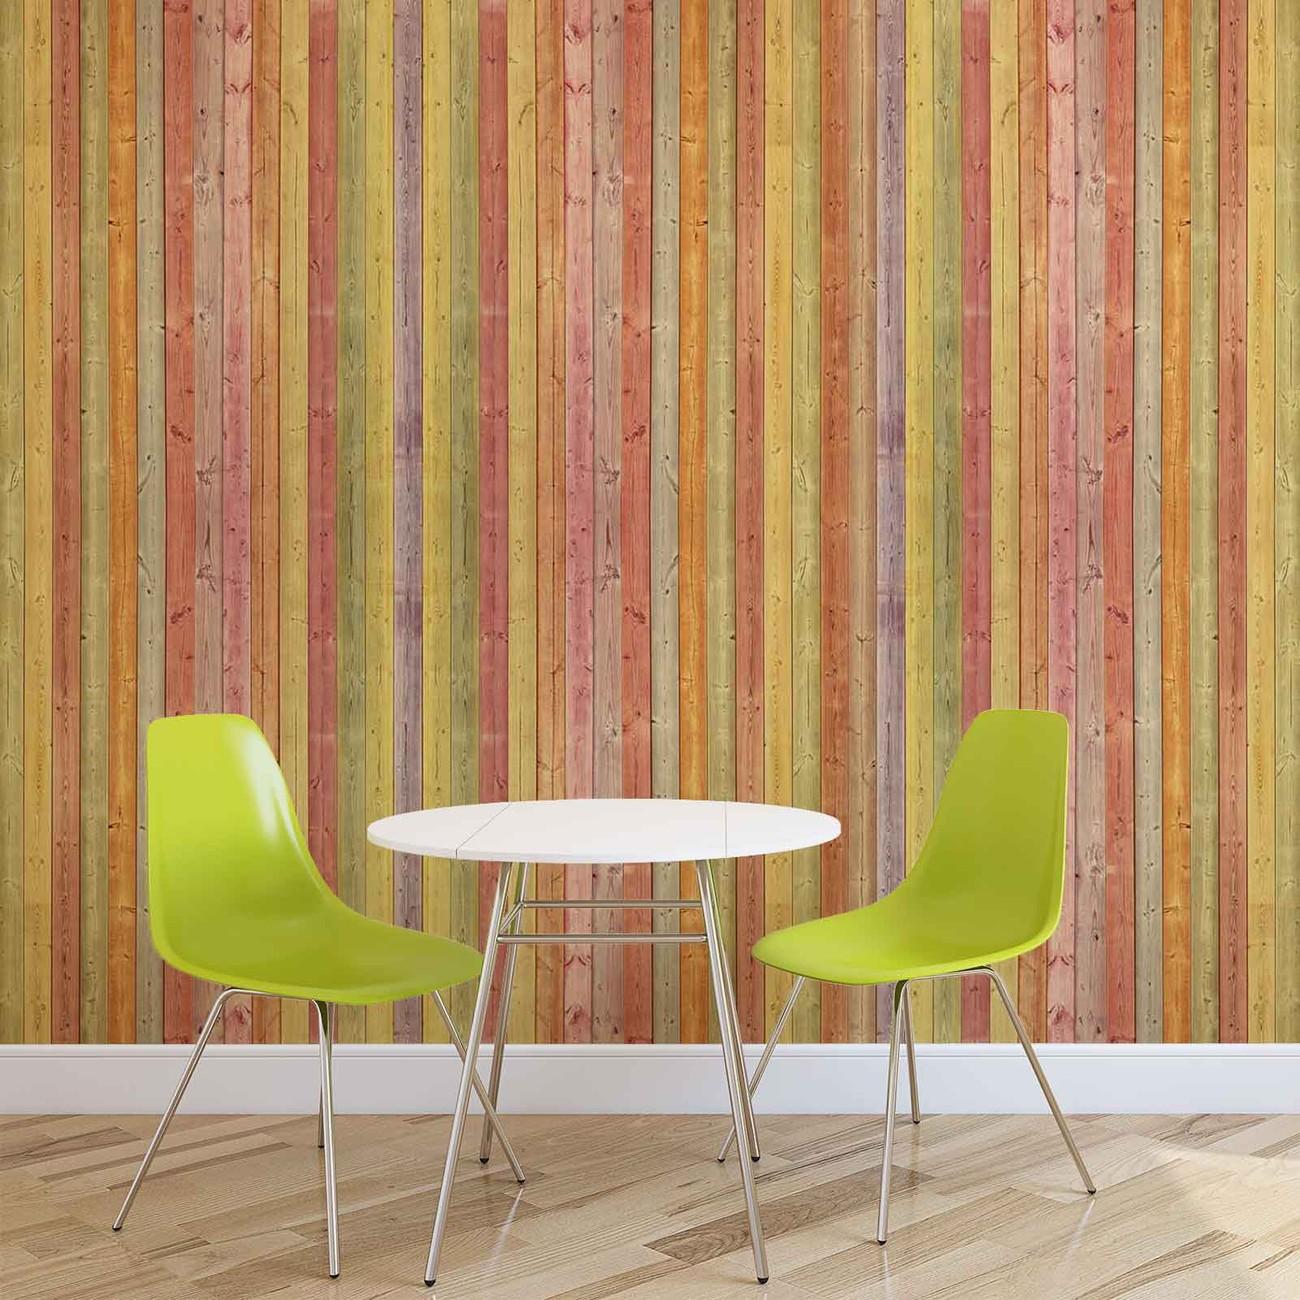 Fotomurale tablones de madera papel pintado for Papel mural tipo madera